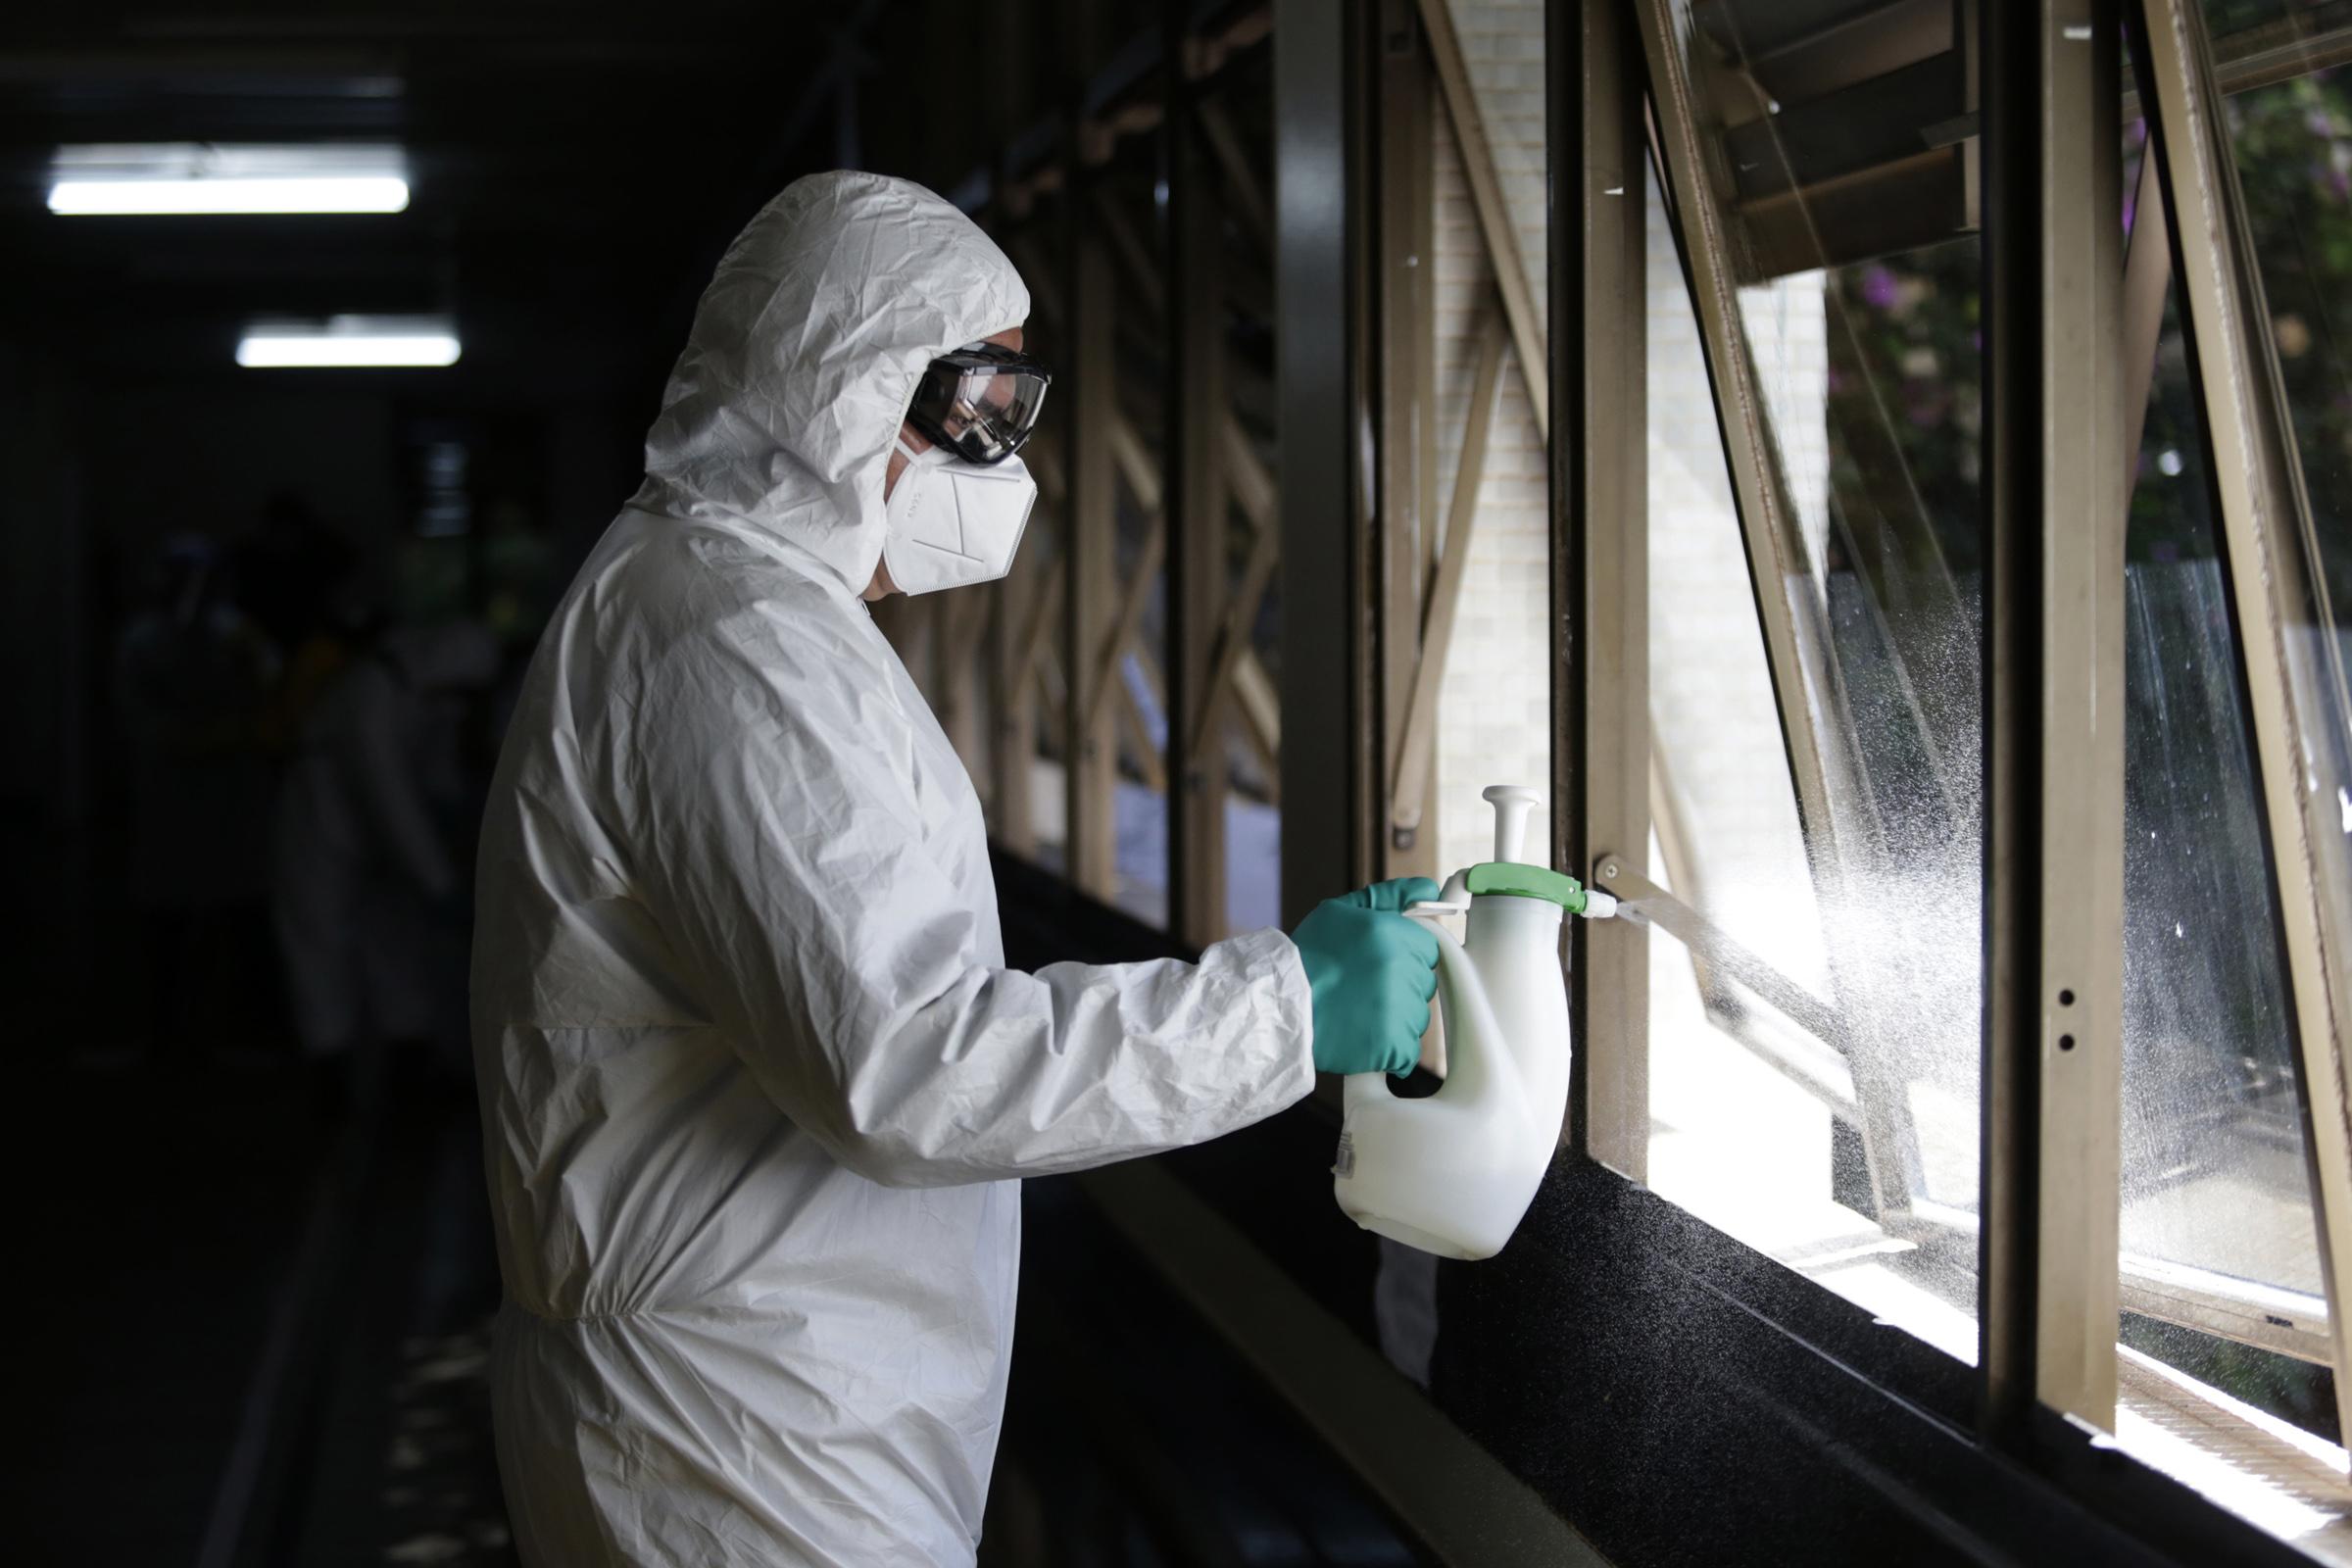 La OMS pide no bajar la guardia frente al coronavirus